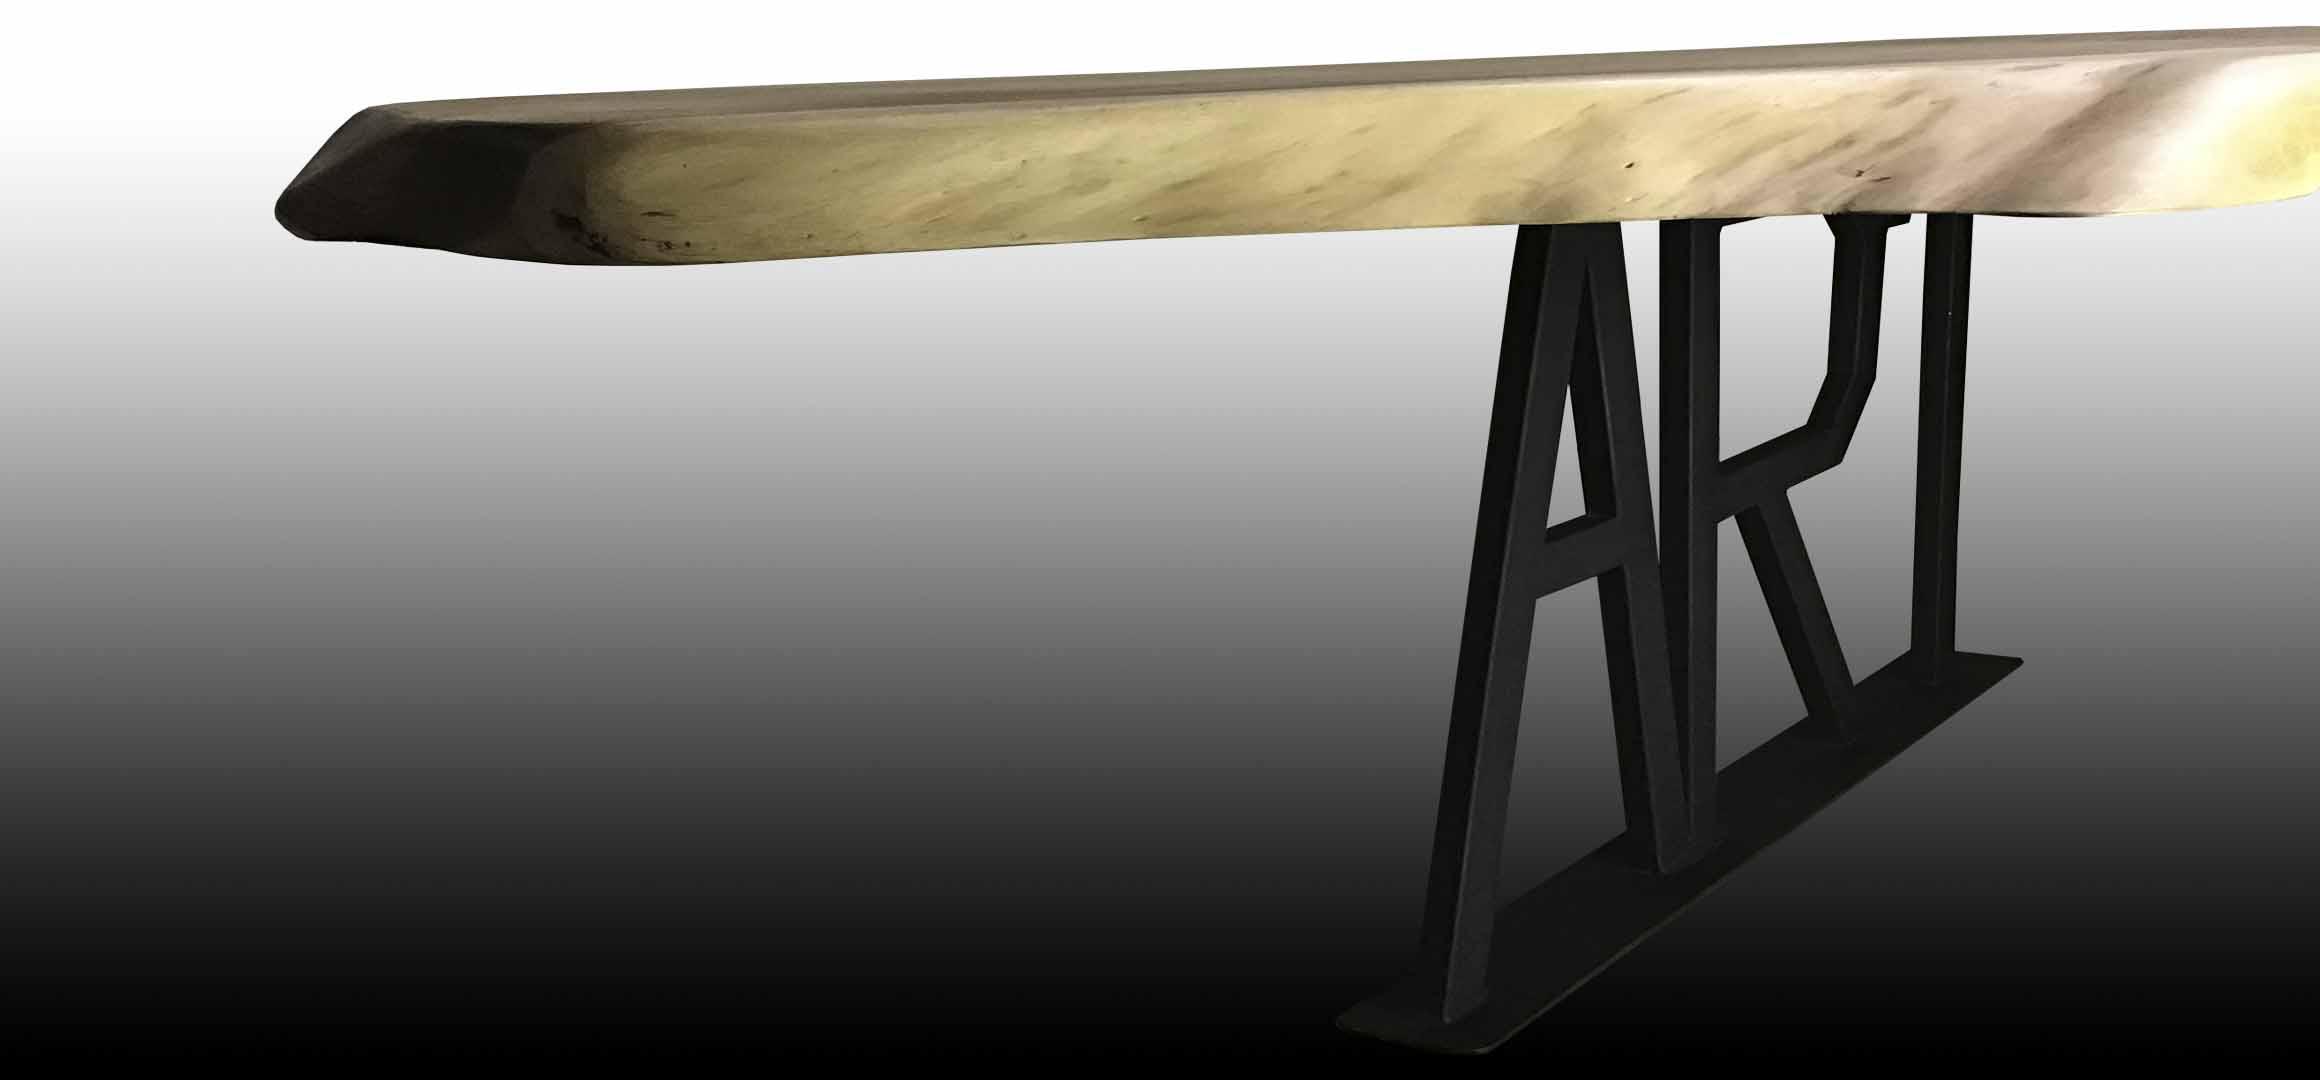 Art live edge table